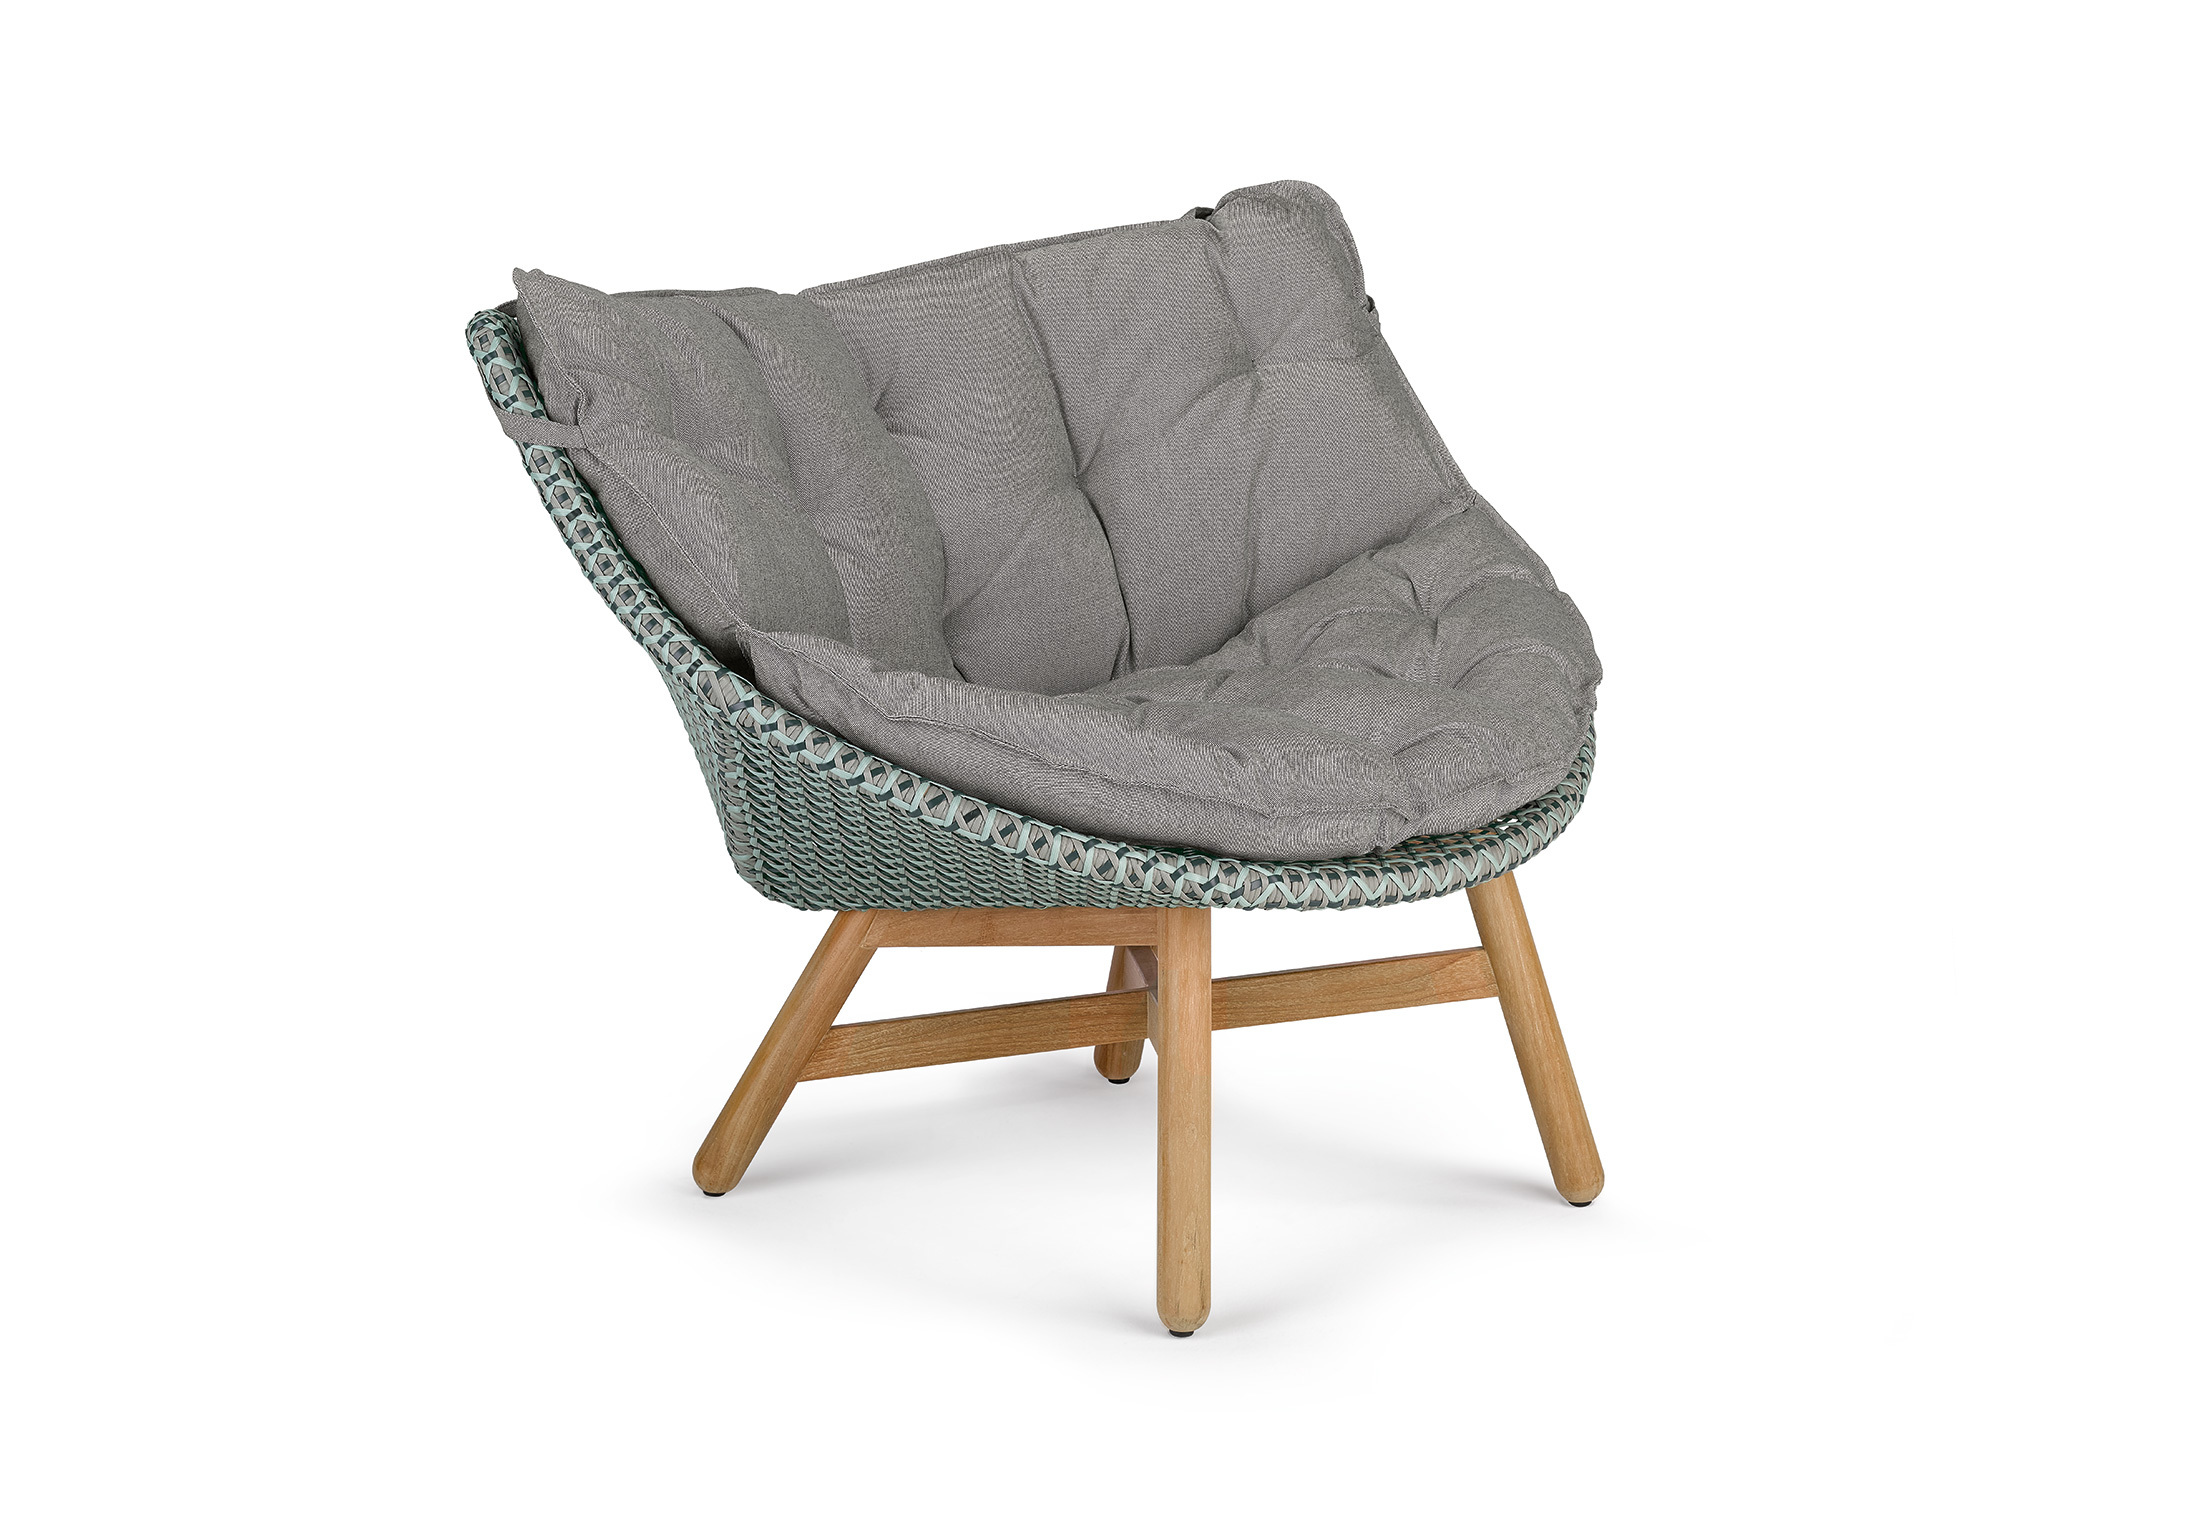 Surprising Mbrace Lounge Chair By Dedon Stylepark Machost Co Dining Chair Design Ideas Machostcouk